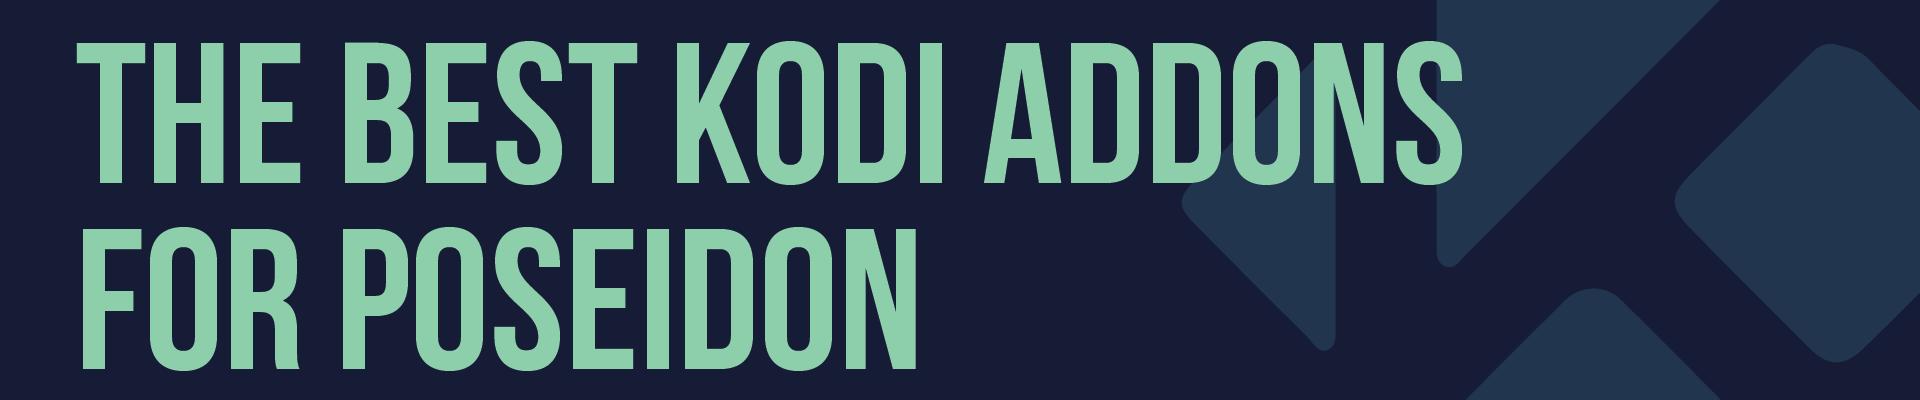 The Best Kodi Addons – Poseidon | BestVPN org